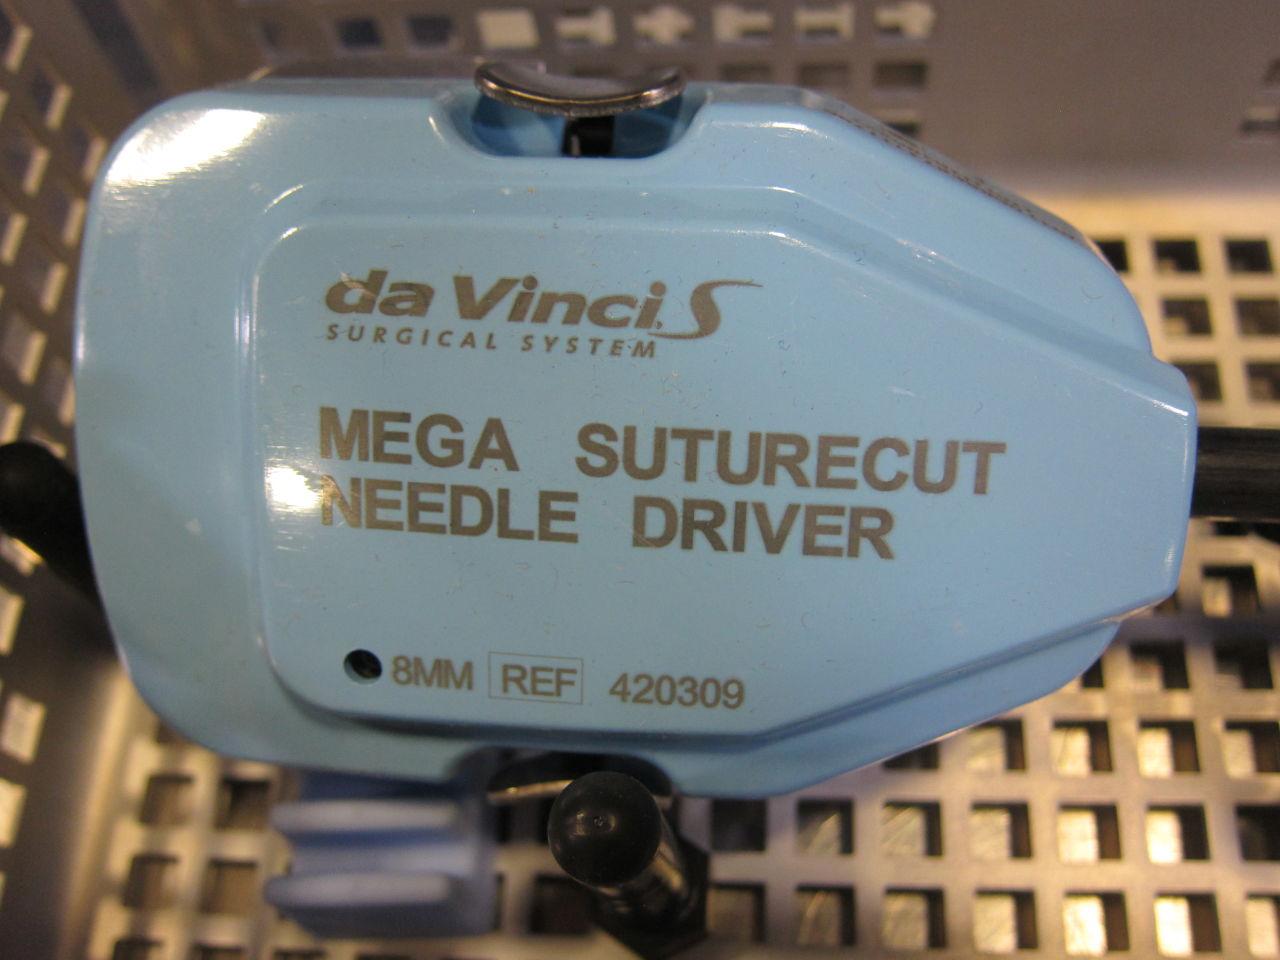 DA VINCI S SURGICAL 420309 Mega Suturecut Needle Driver